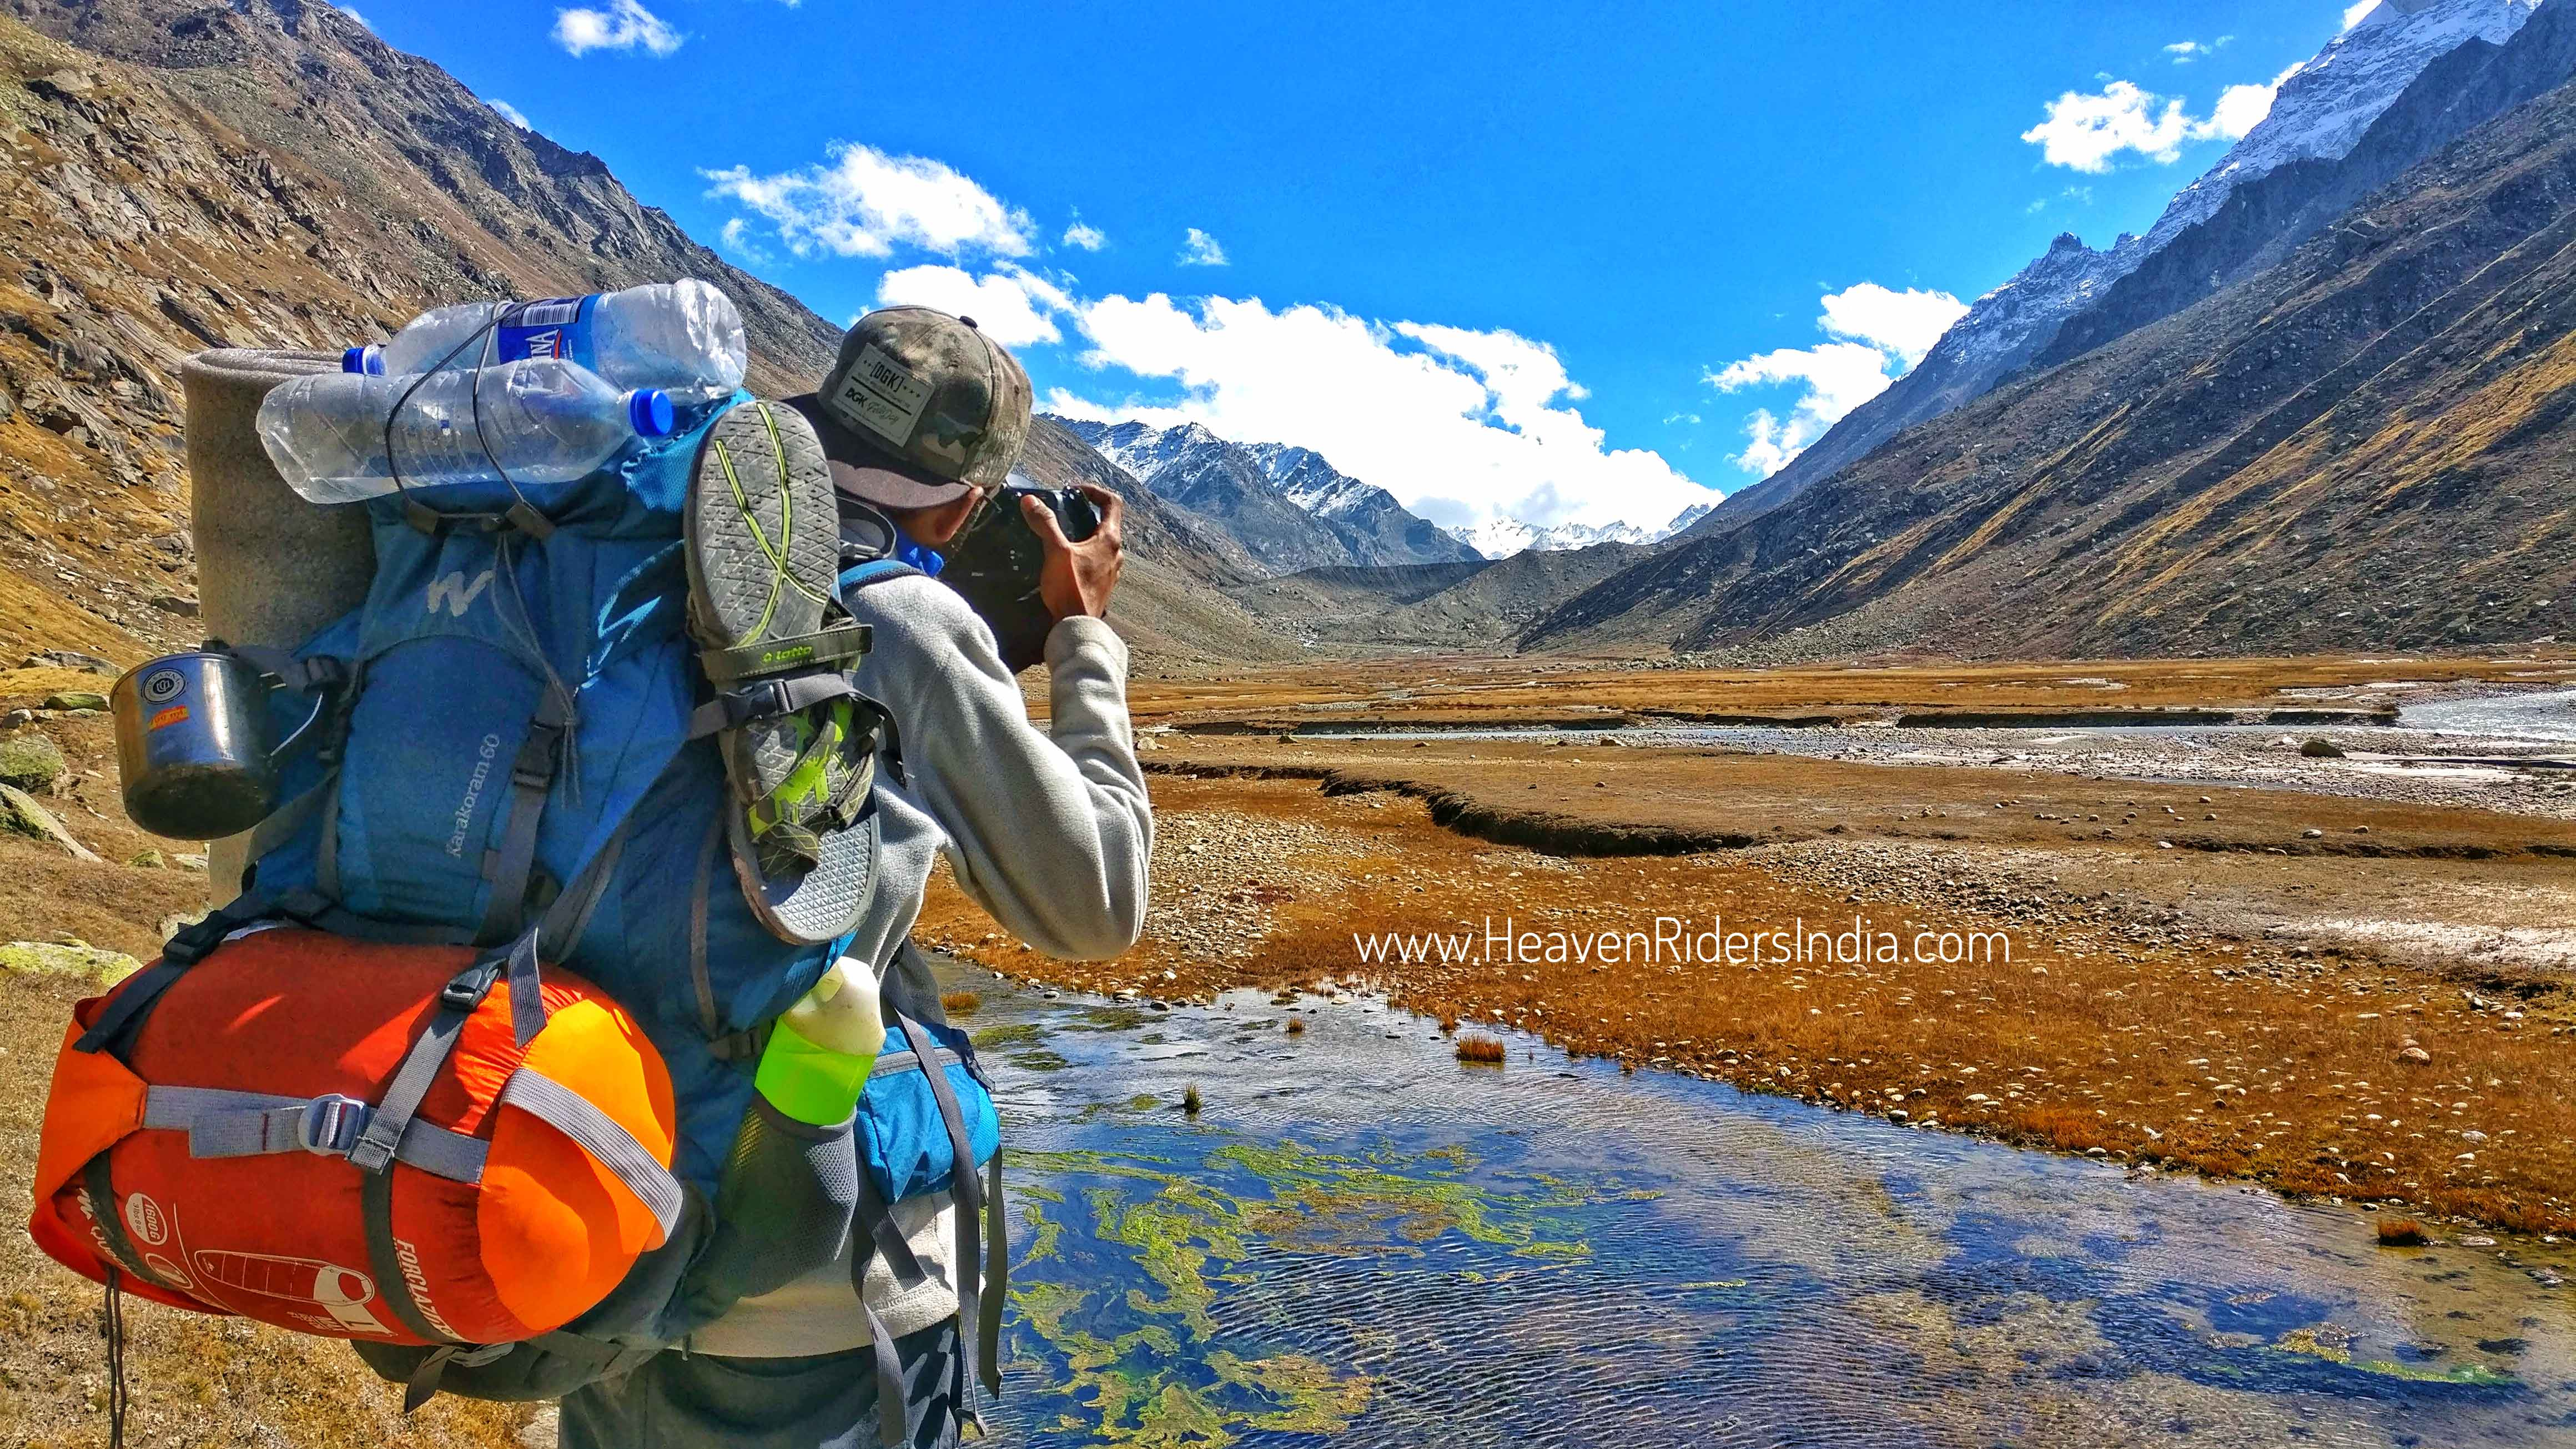 Mantalai Lake Trek - Awesome trek for photography